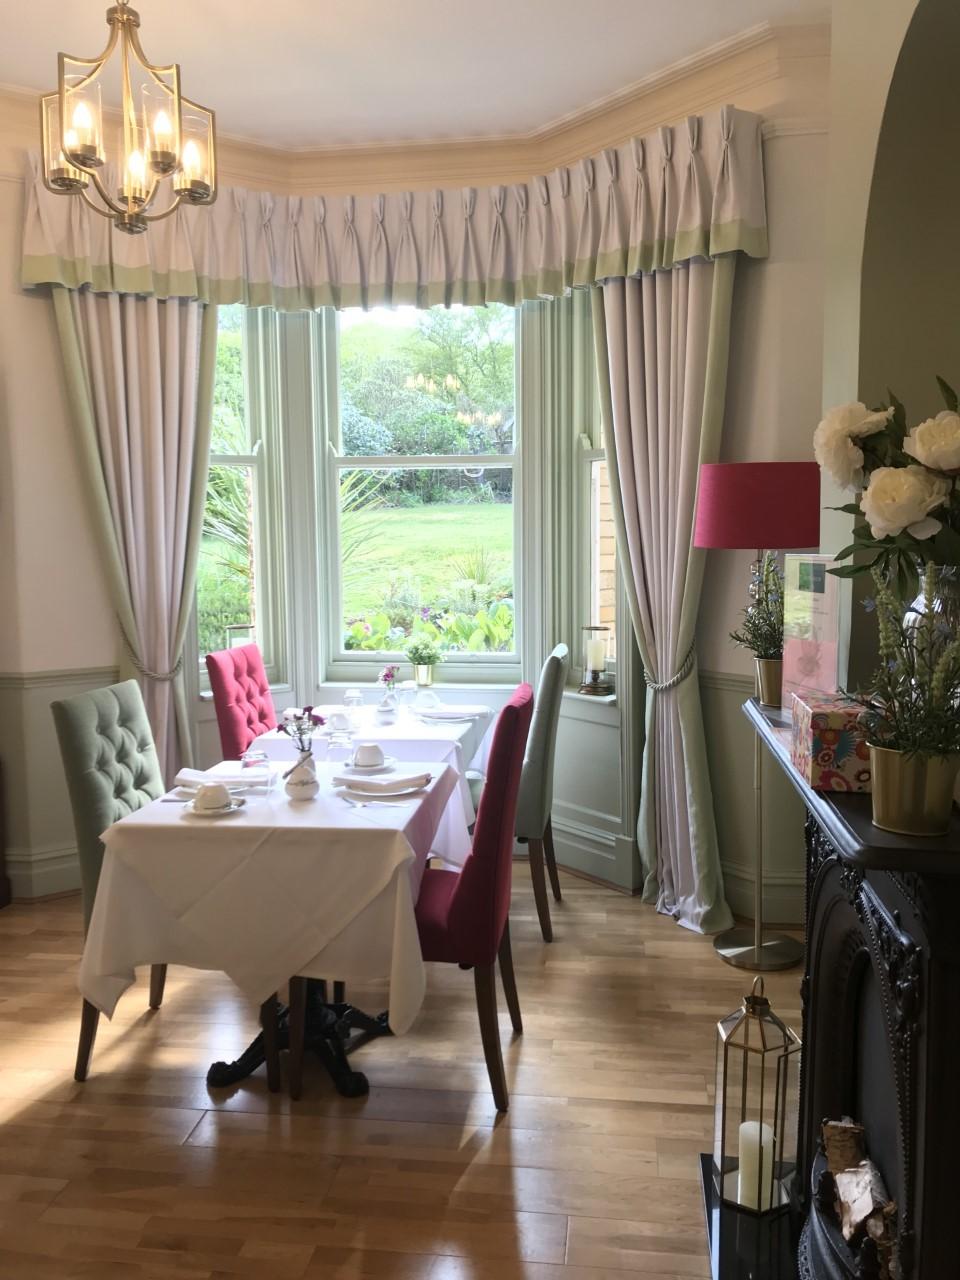 Tea room with distinctive style opens